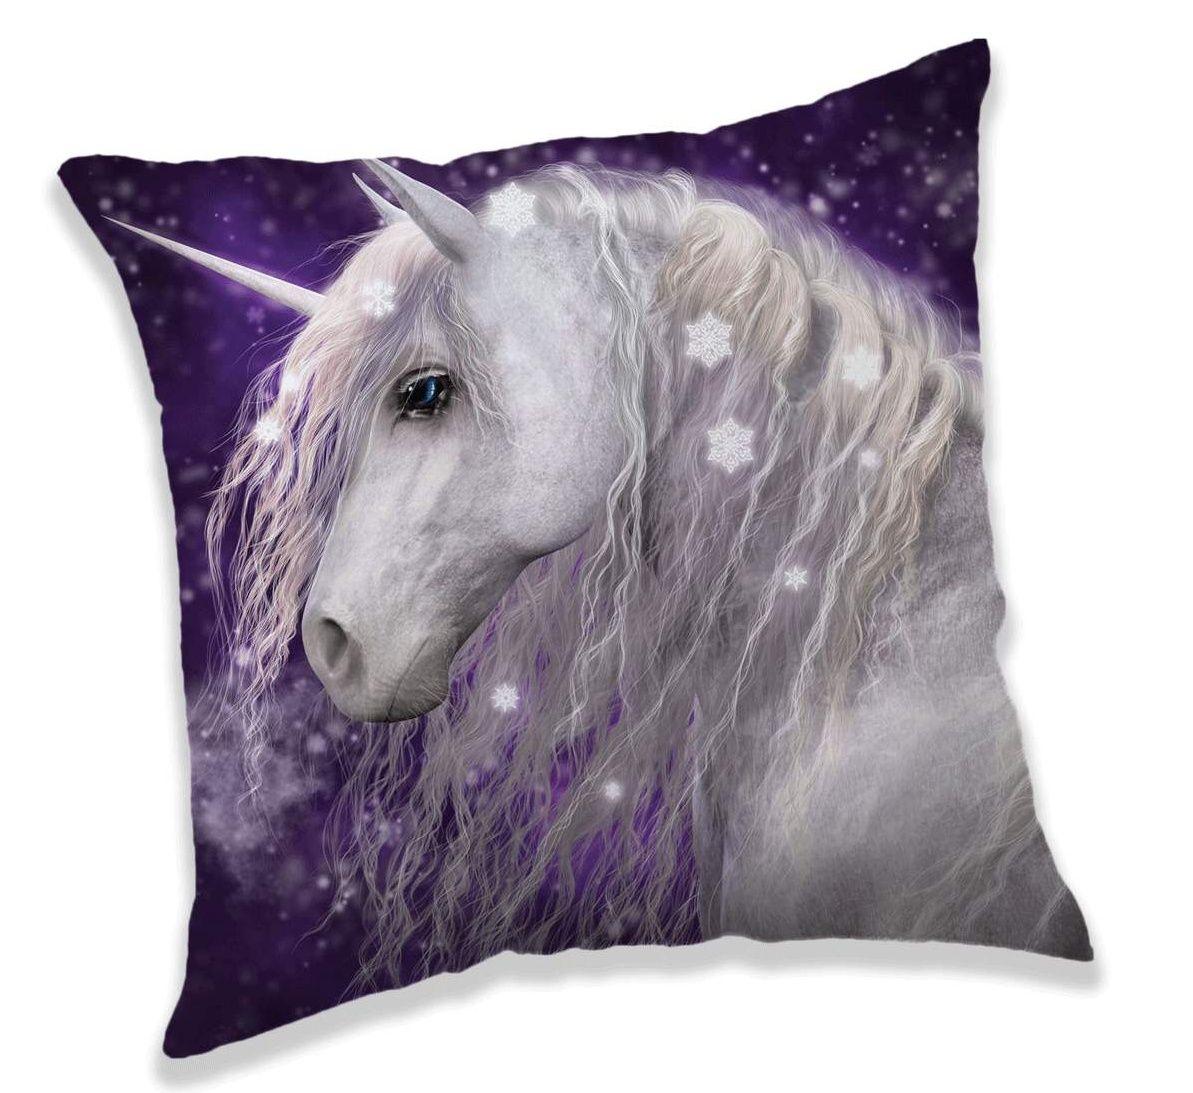 Povlak na polštář Unicorn, jednorožec o rozměru 40x40 Jerry Fabrics